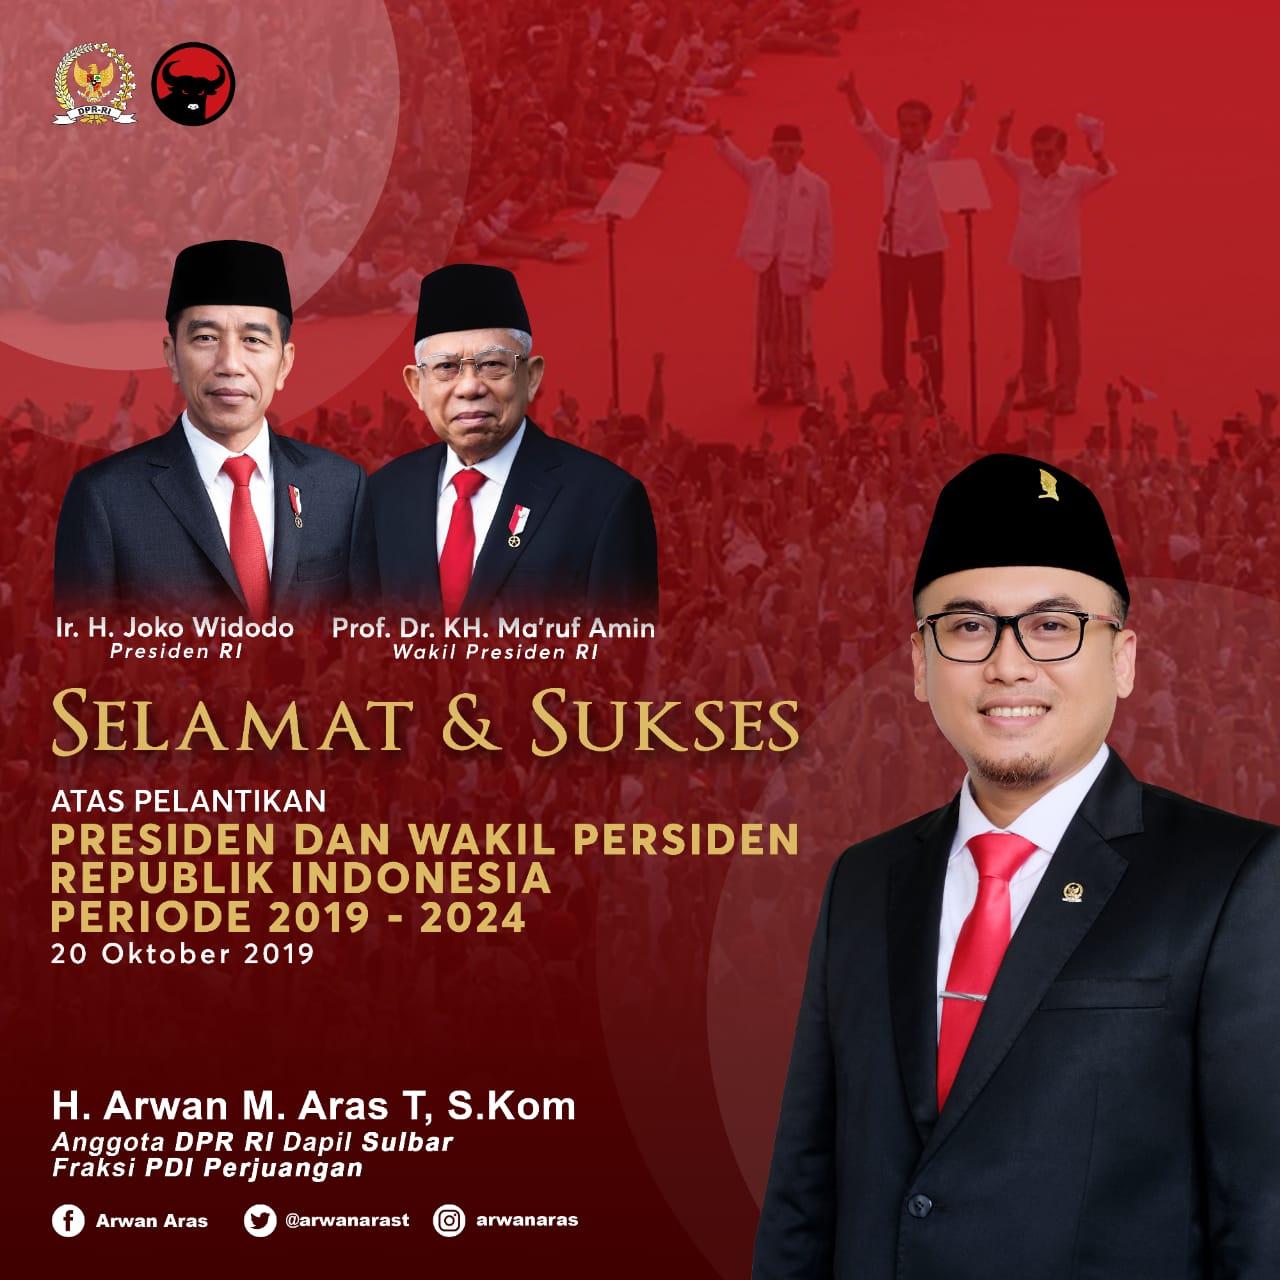 Arwan : Kita Optimis Indonesia Semakin Maju